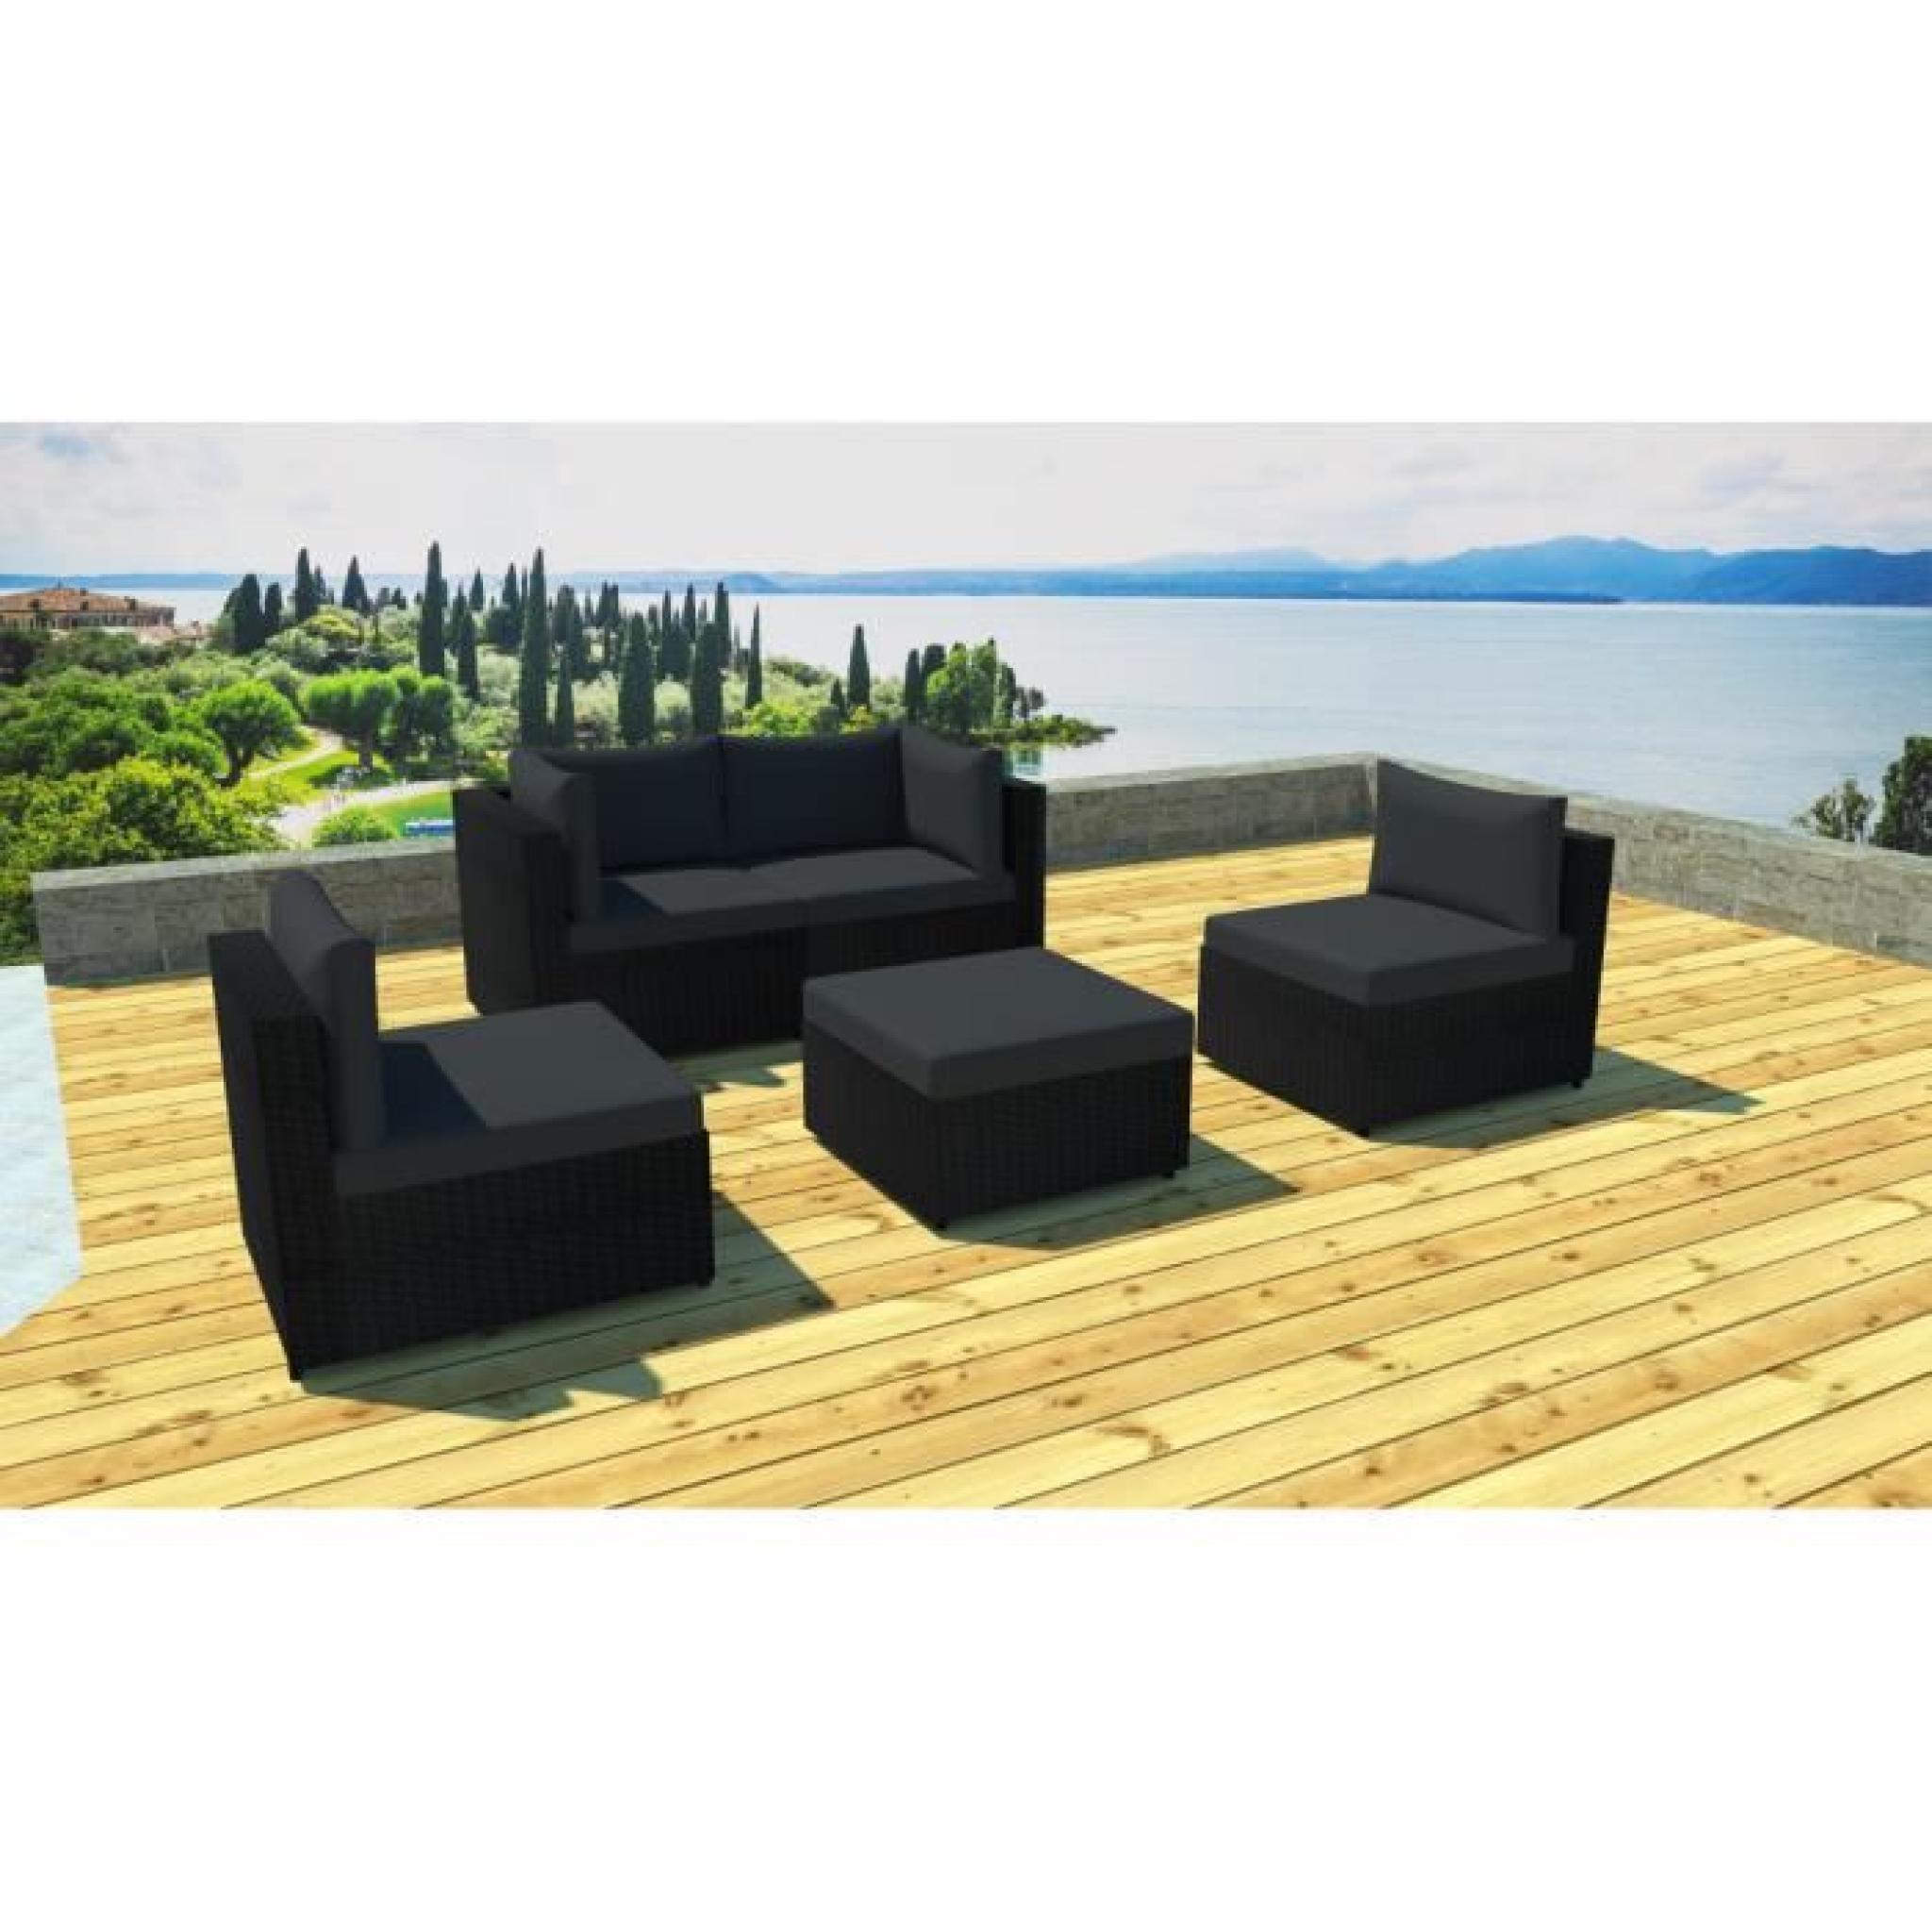 salon de jardin modulable 5 places en r sine noir noir achat vente salon de jardin en resine. Black Bedroom Furniture Sets. Home Design Ideas